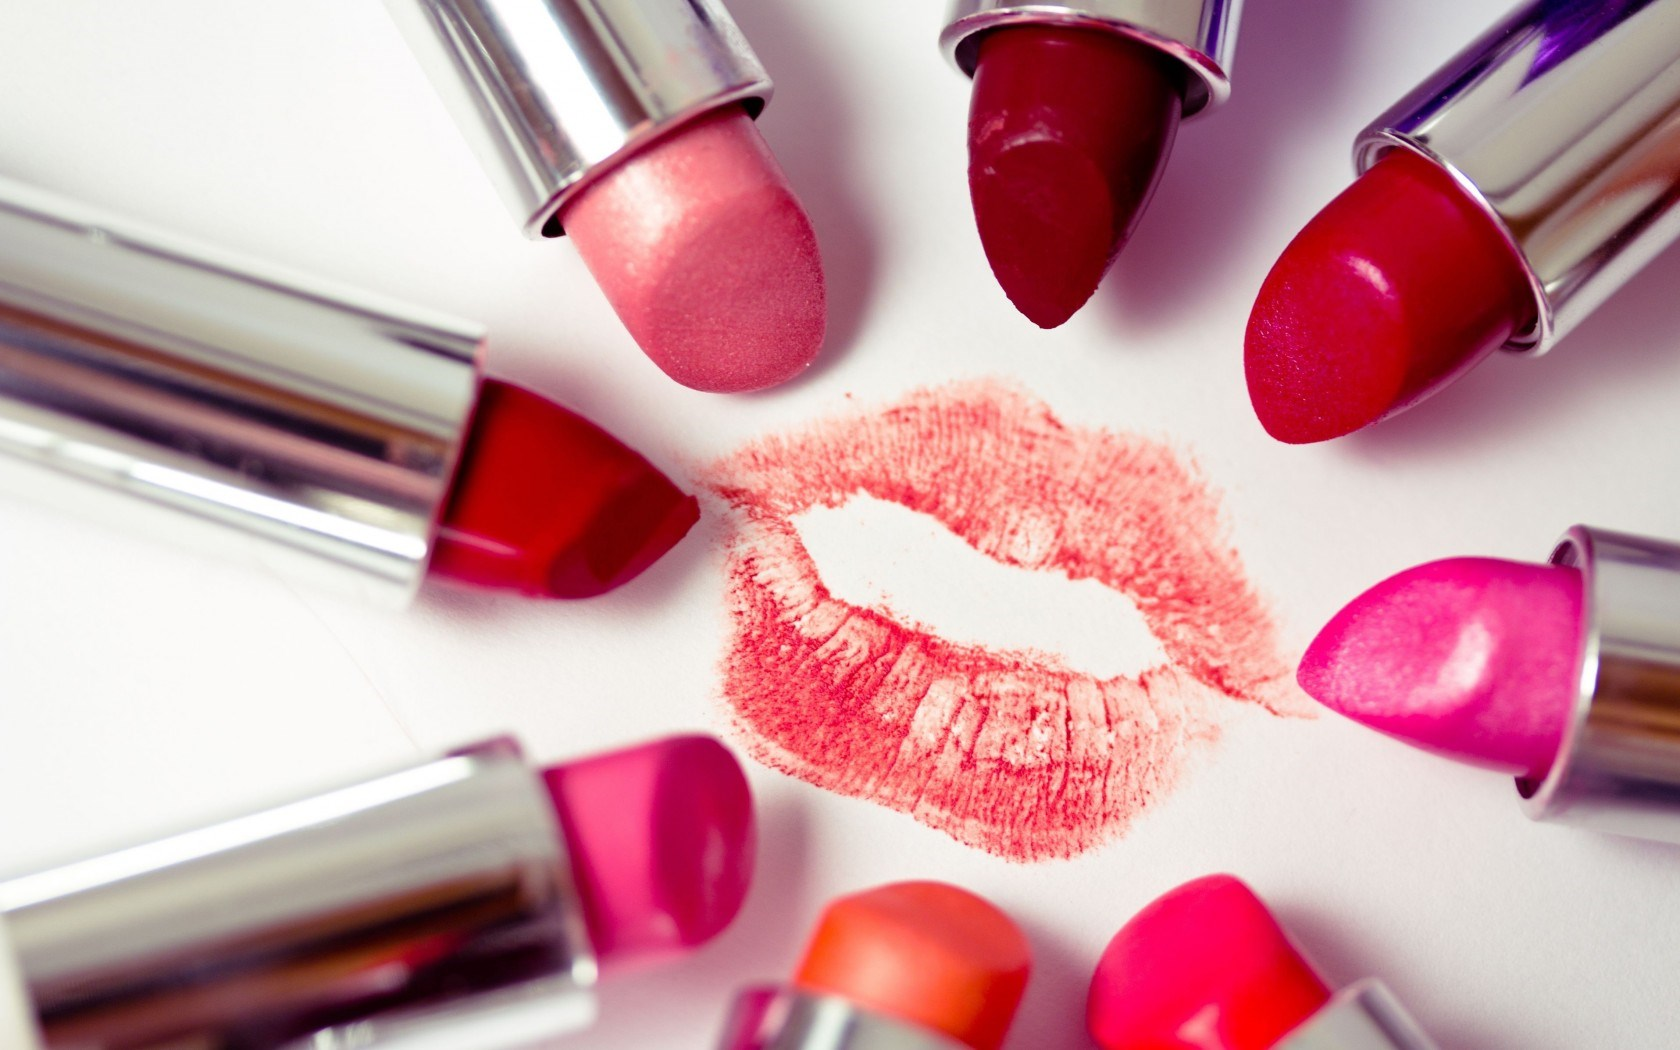 Wallpaper 3d Funny Lipstick Wallpapers Hd Wallpaper